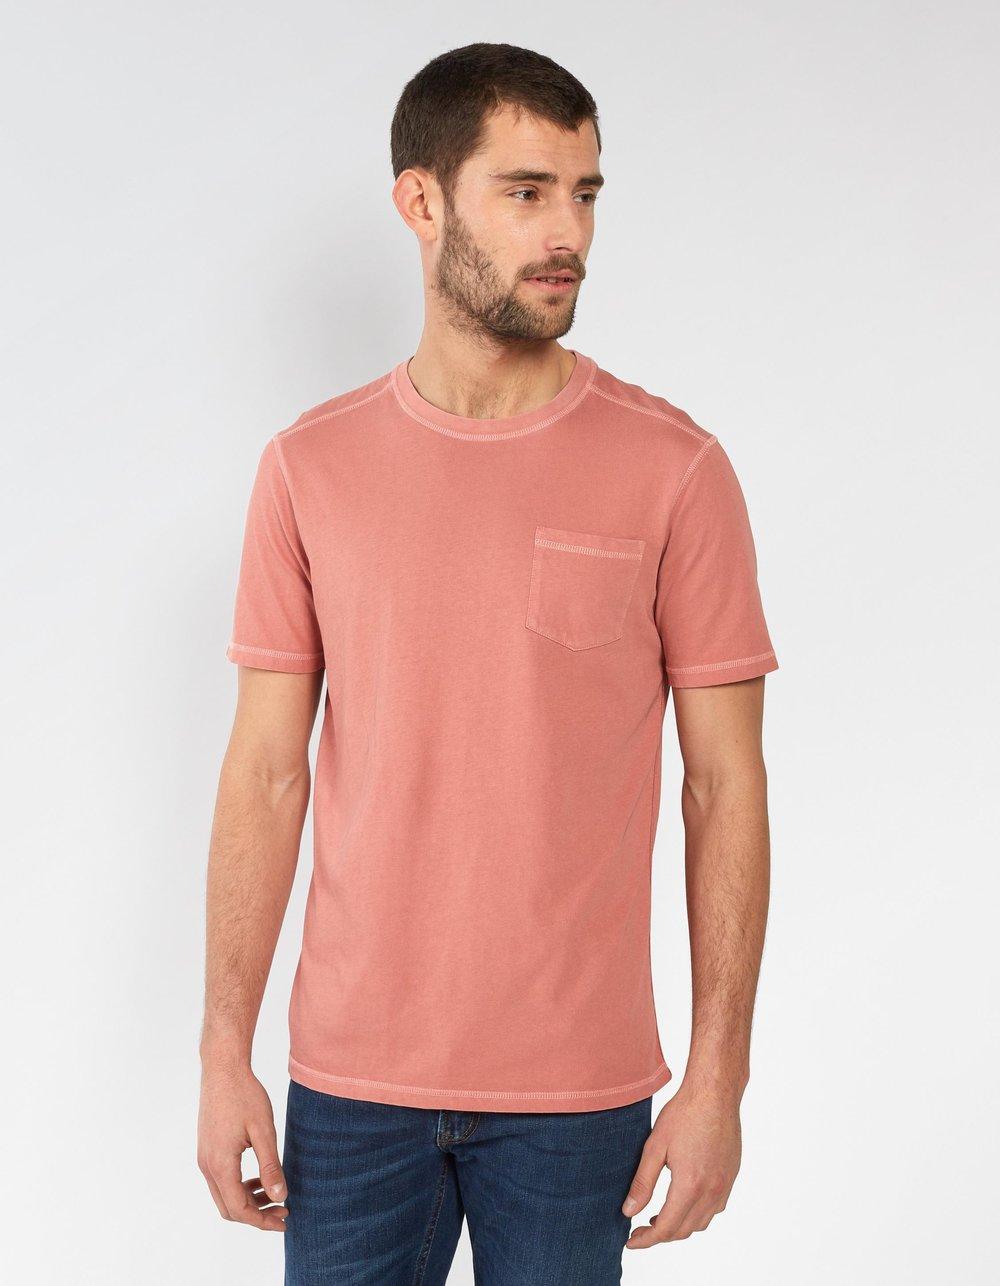 Dusty Pink Hemp Cotton T-Shirt -